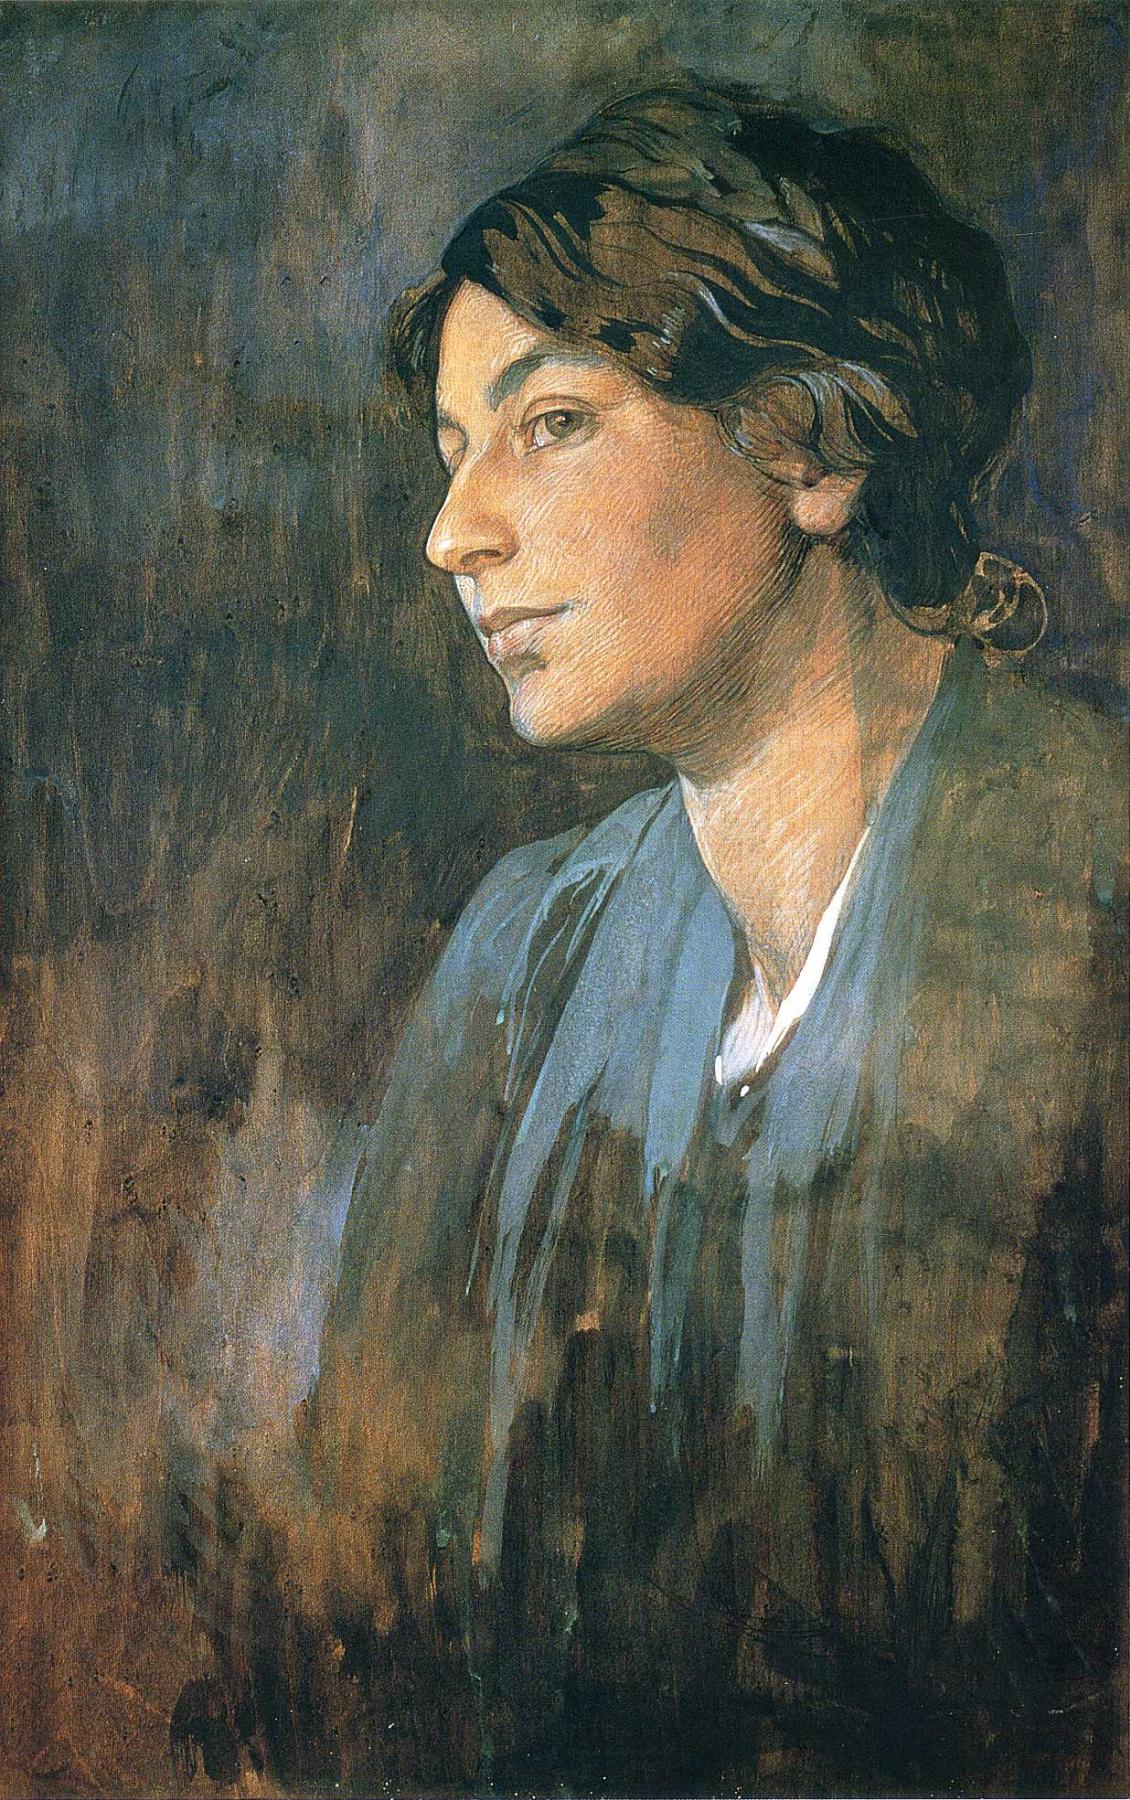 Alfonse Mucha. Portrait of Maruška, the artist's wife